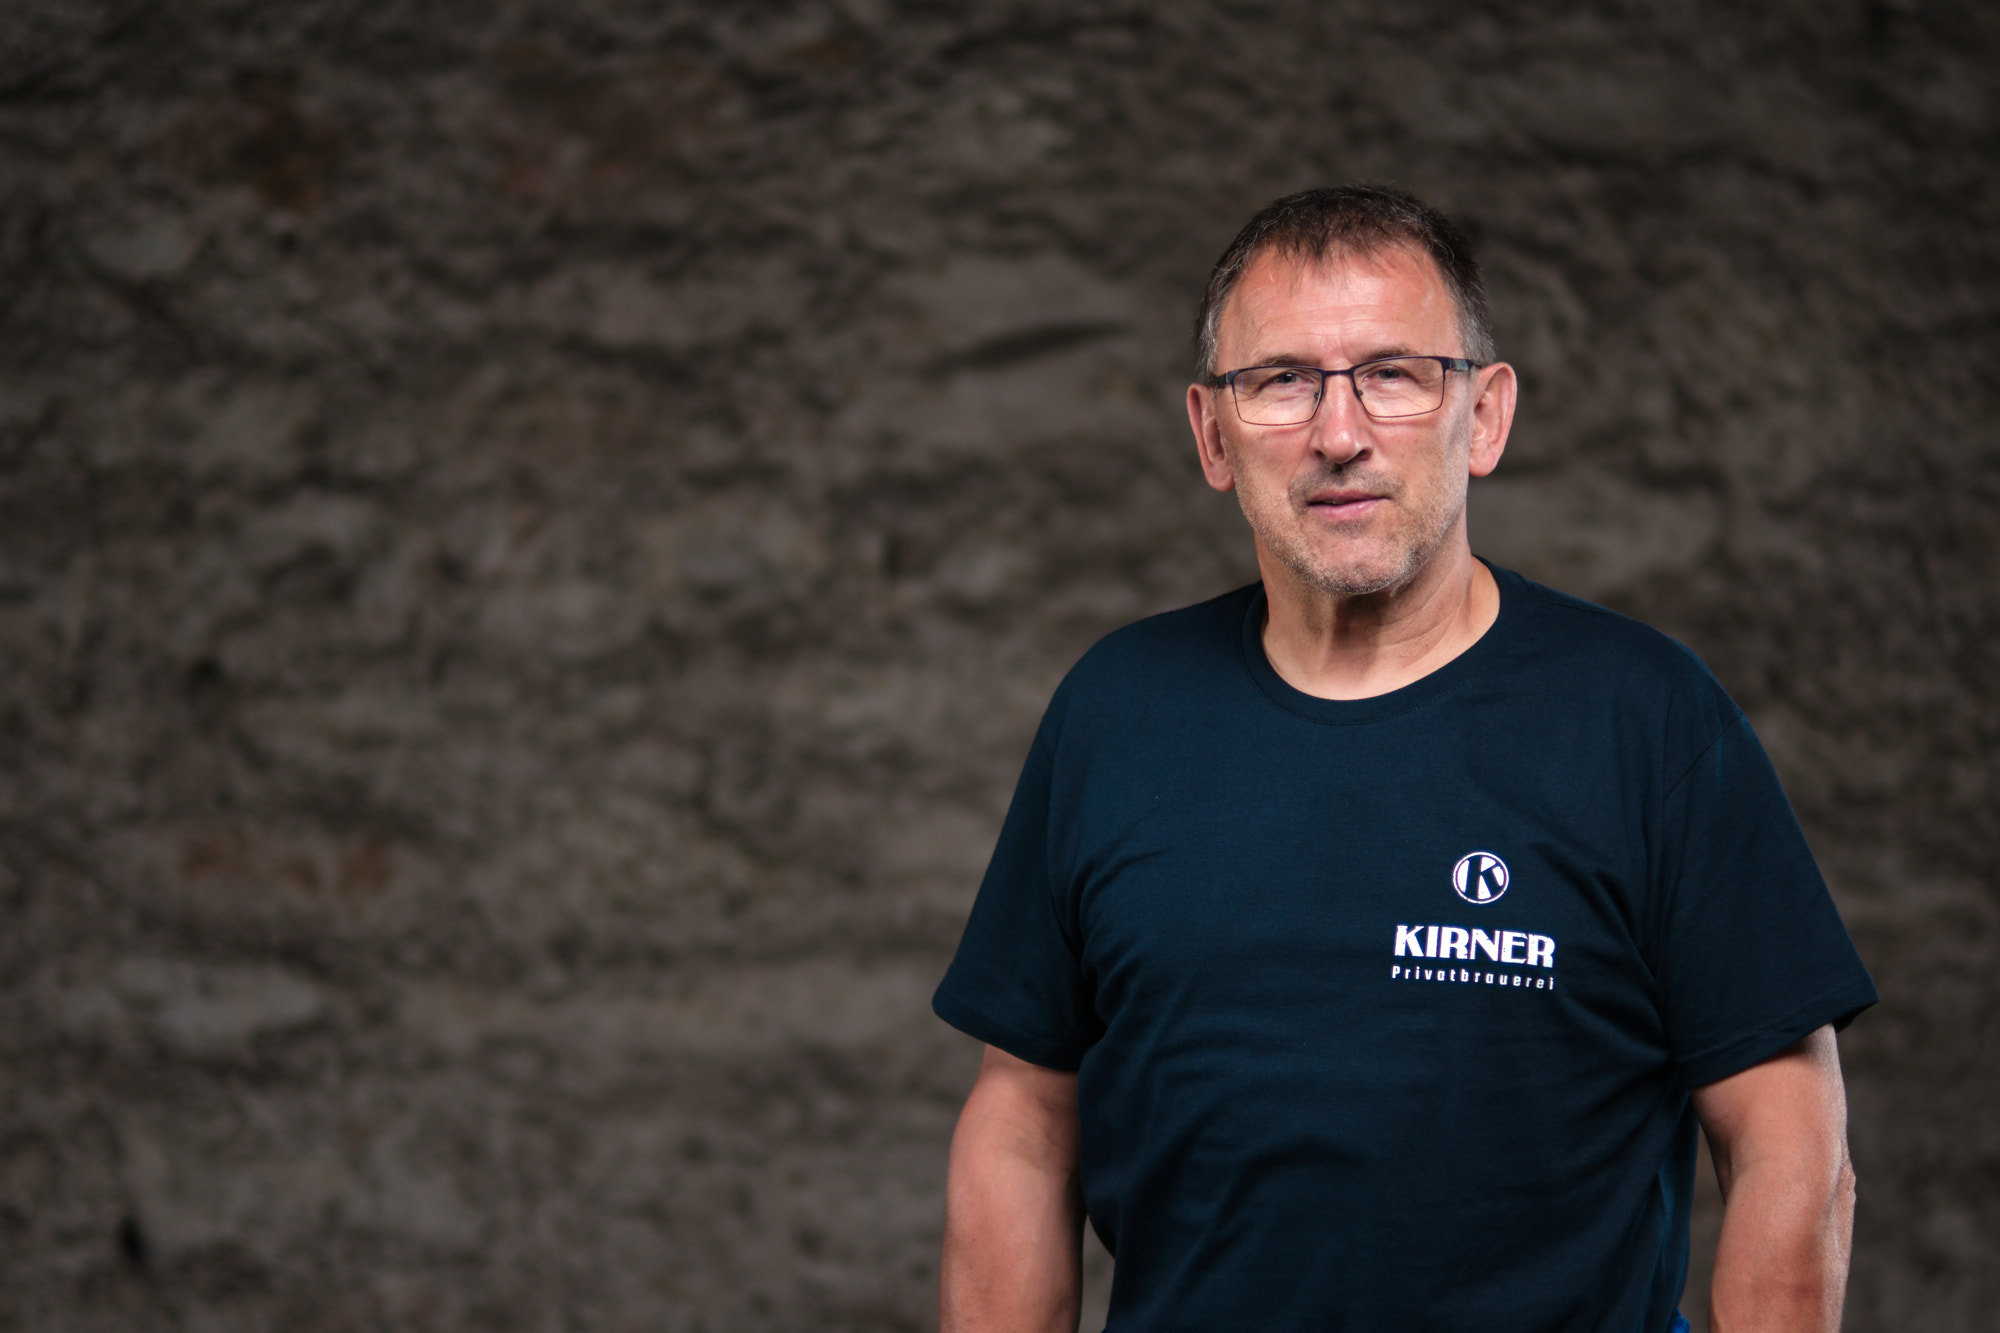 Martin Horbach